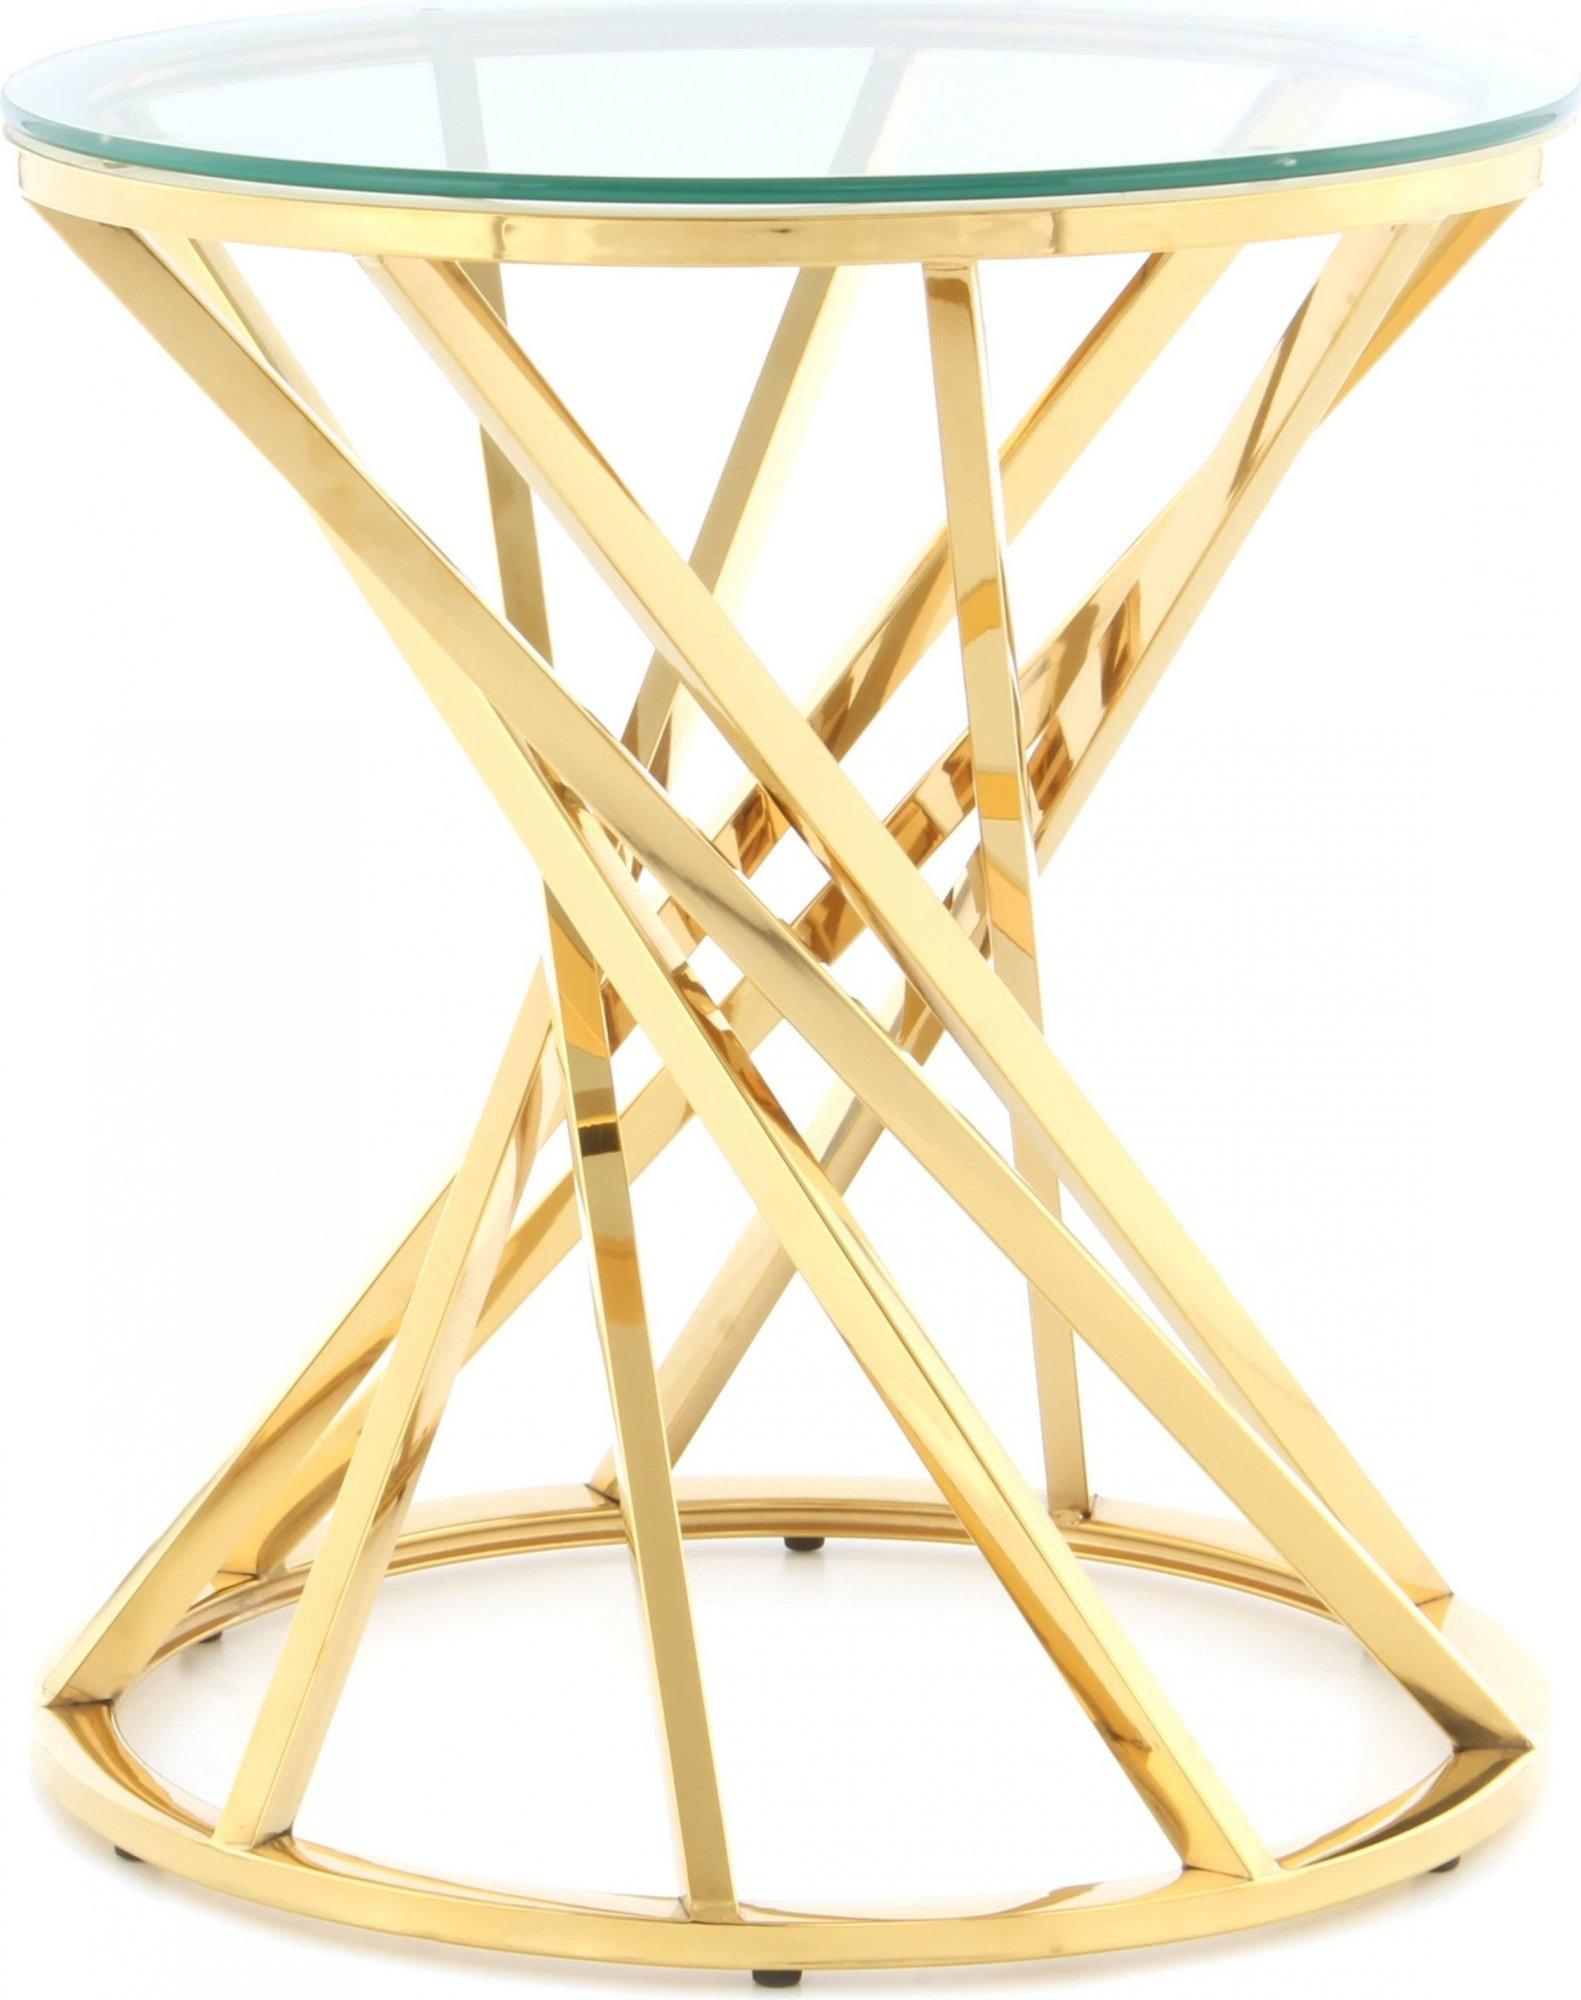 Table d'appoint ronde or plateau verre d50cm